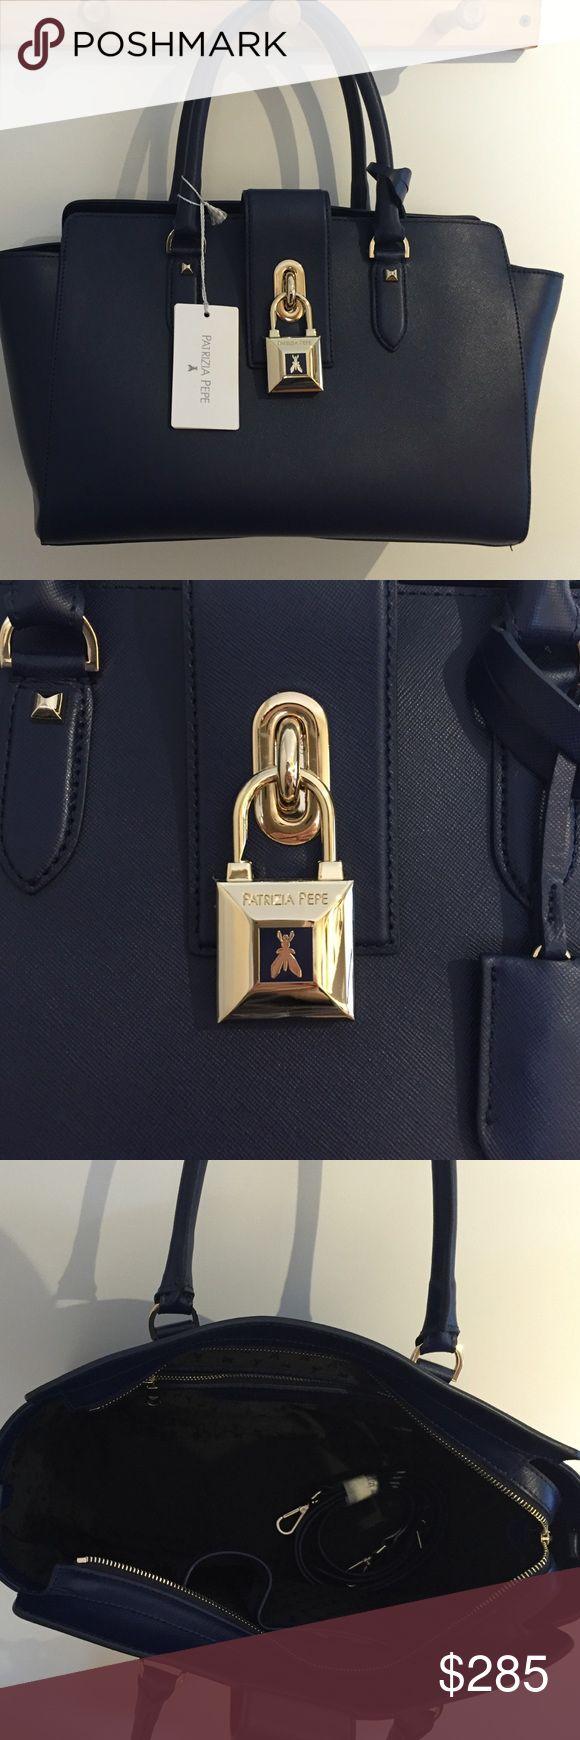 Patrizia Pepe Blue Leather Women's Large Handbag Patrizia Pepe Dress Blue Leather Women's Large Handbag 2V4912/AT78. Patrizia Pepe Bags Shoulder Bags